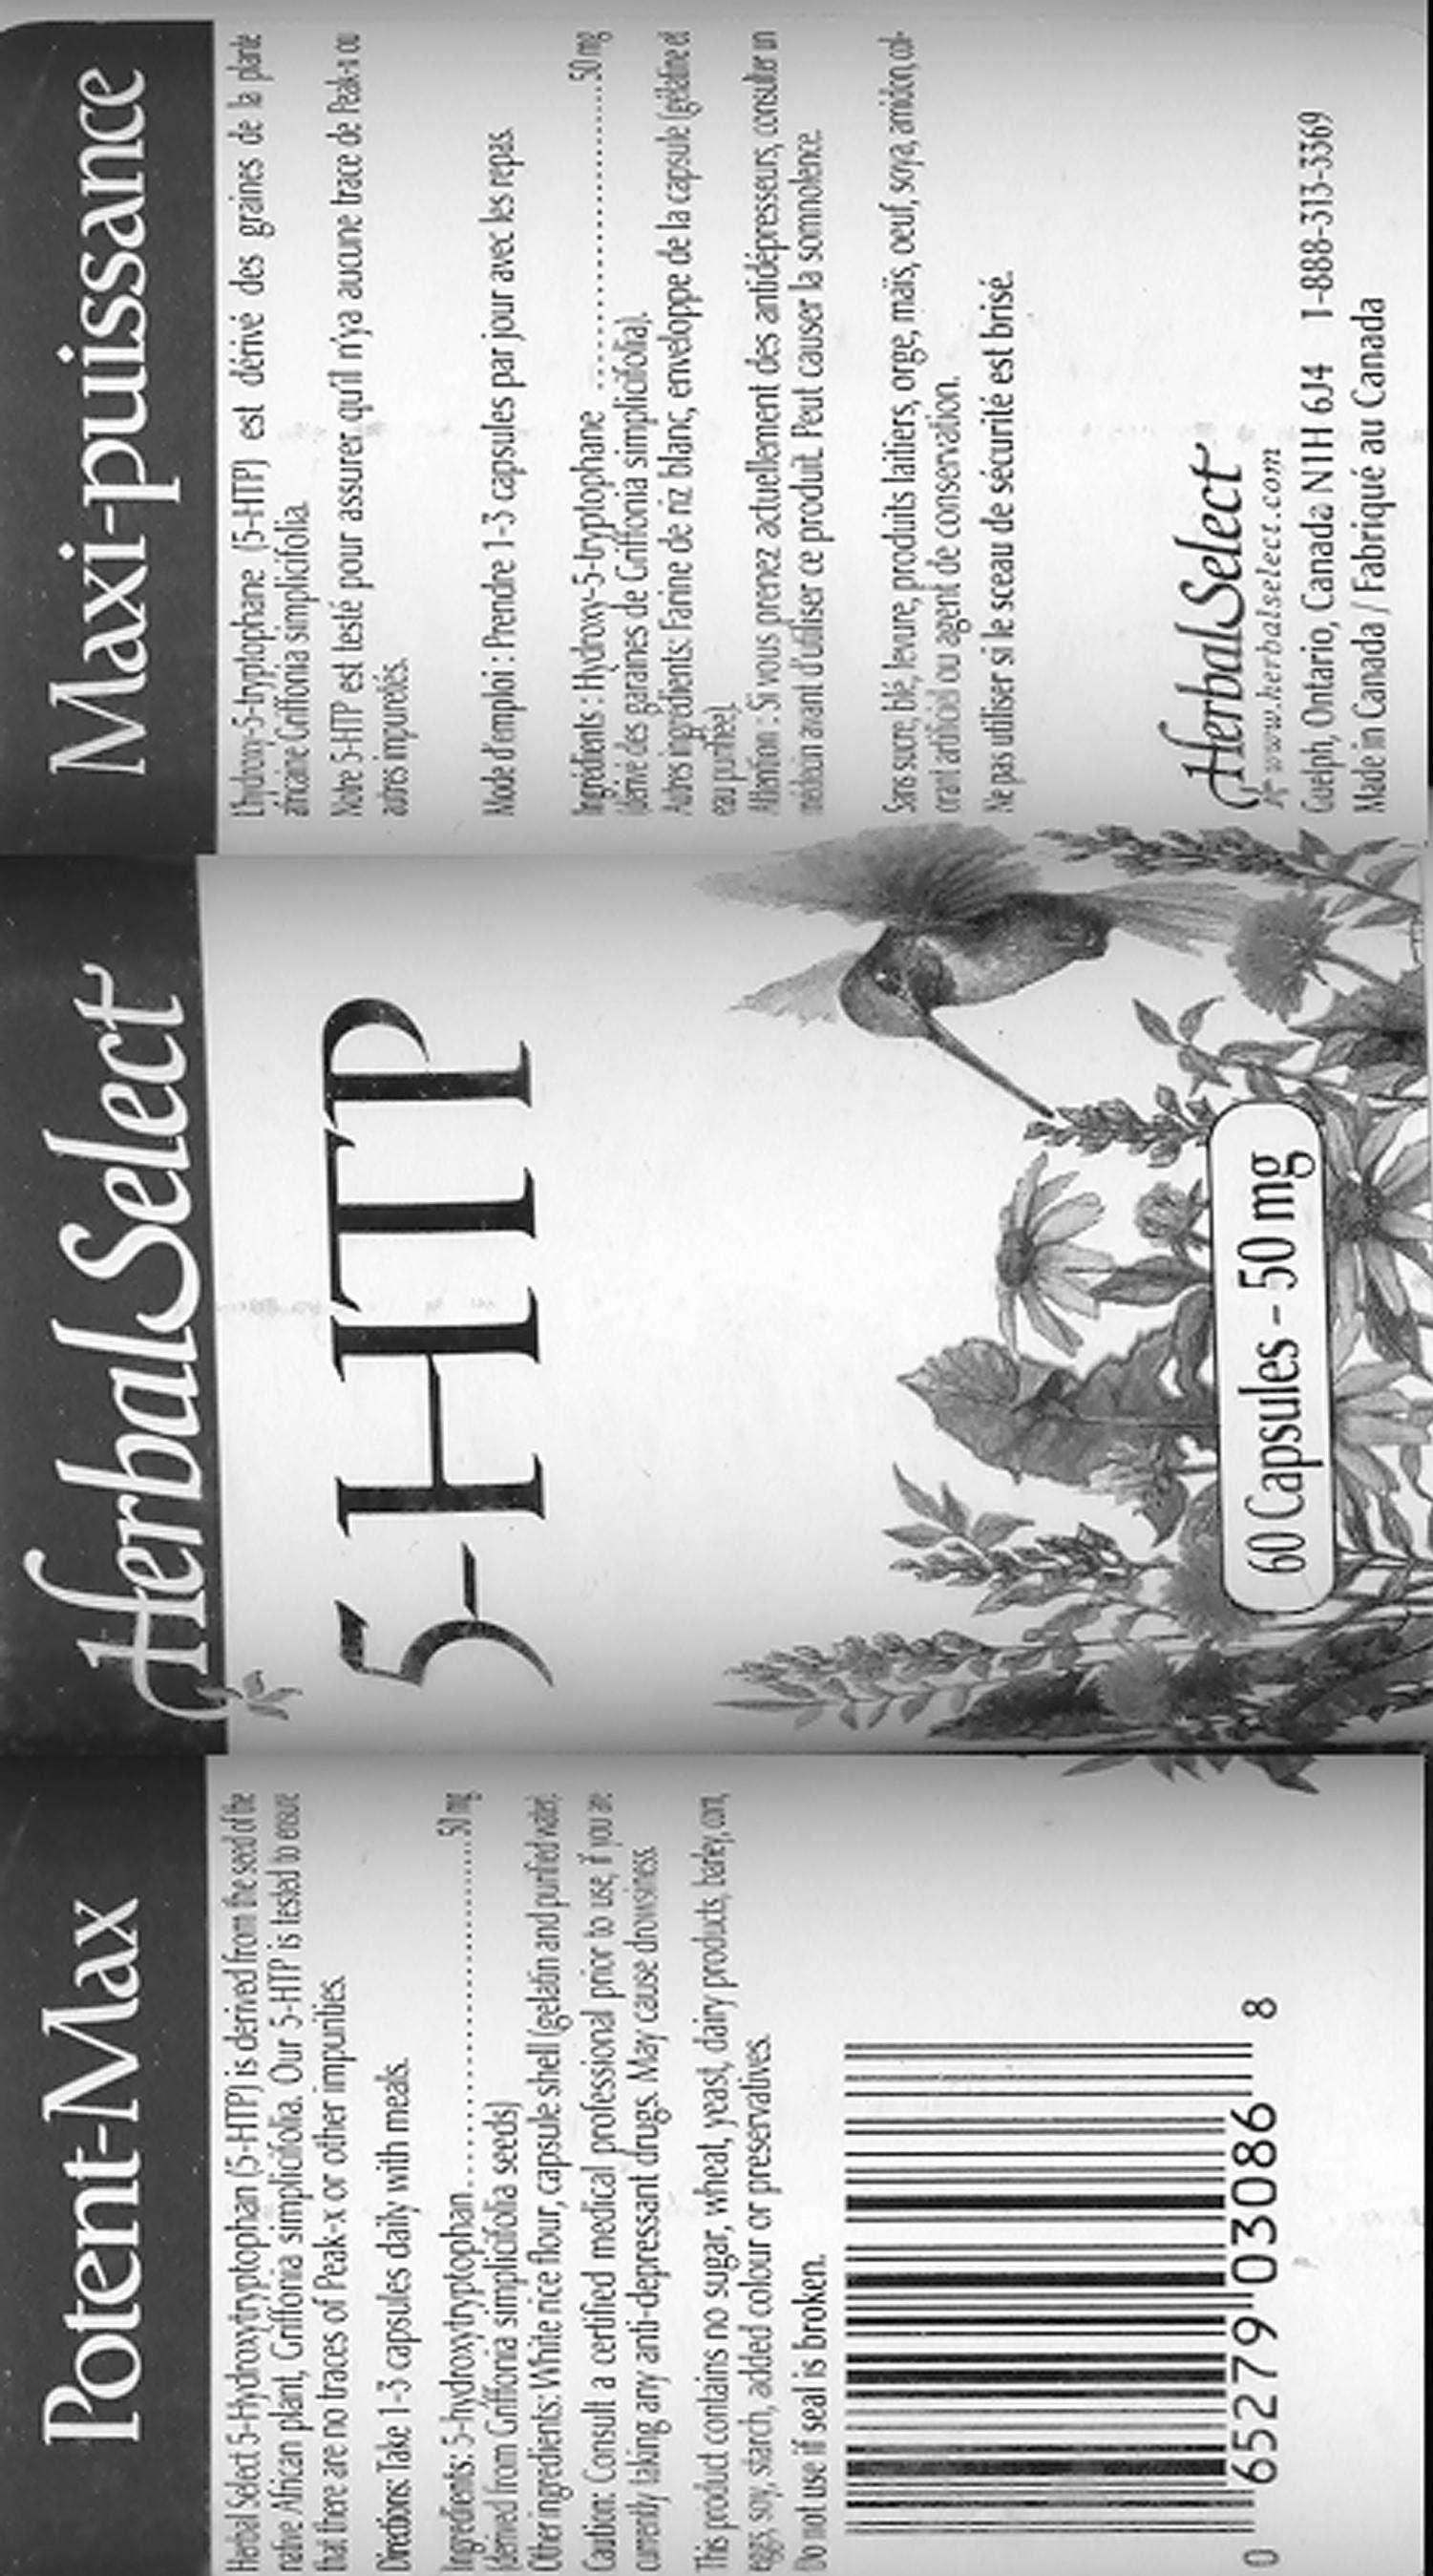 5-HTP - Griffonia Simplicifolia - 50 mg - Label